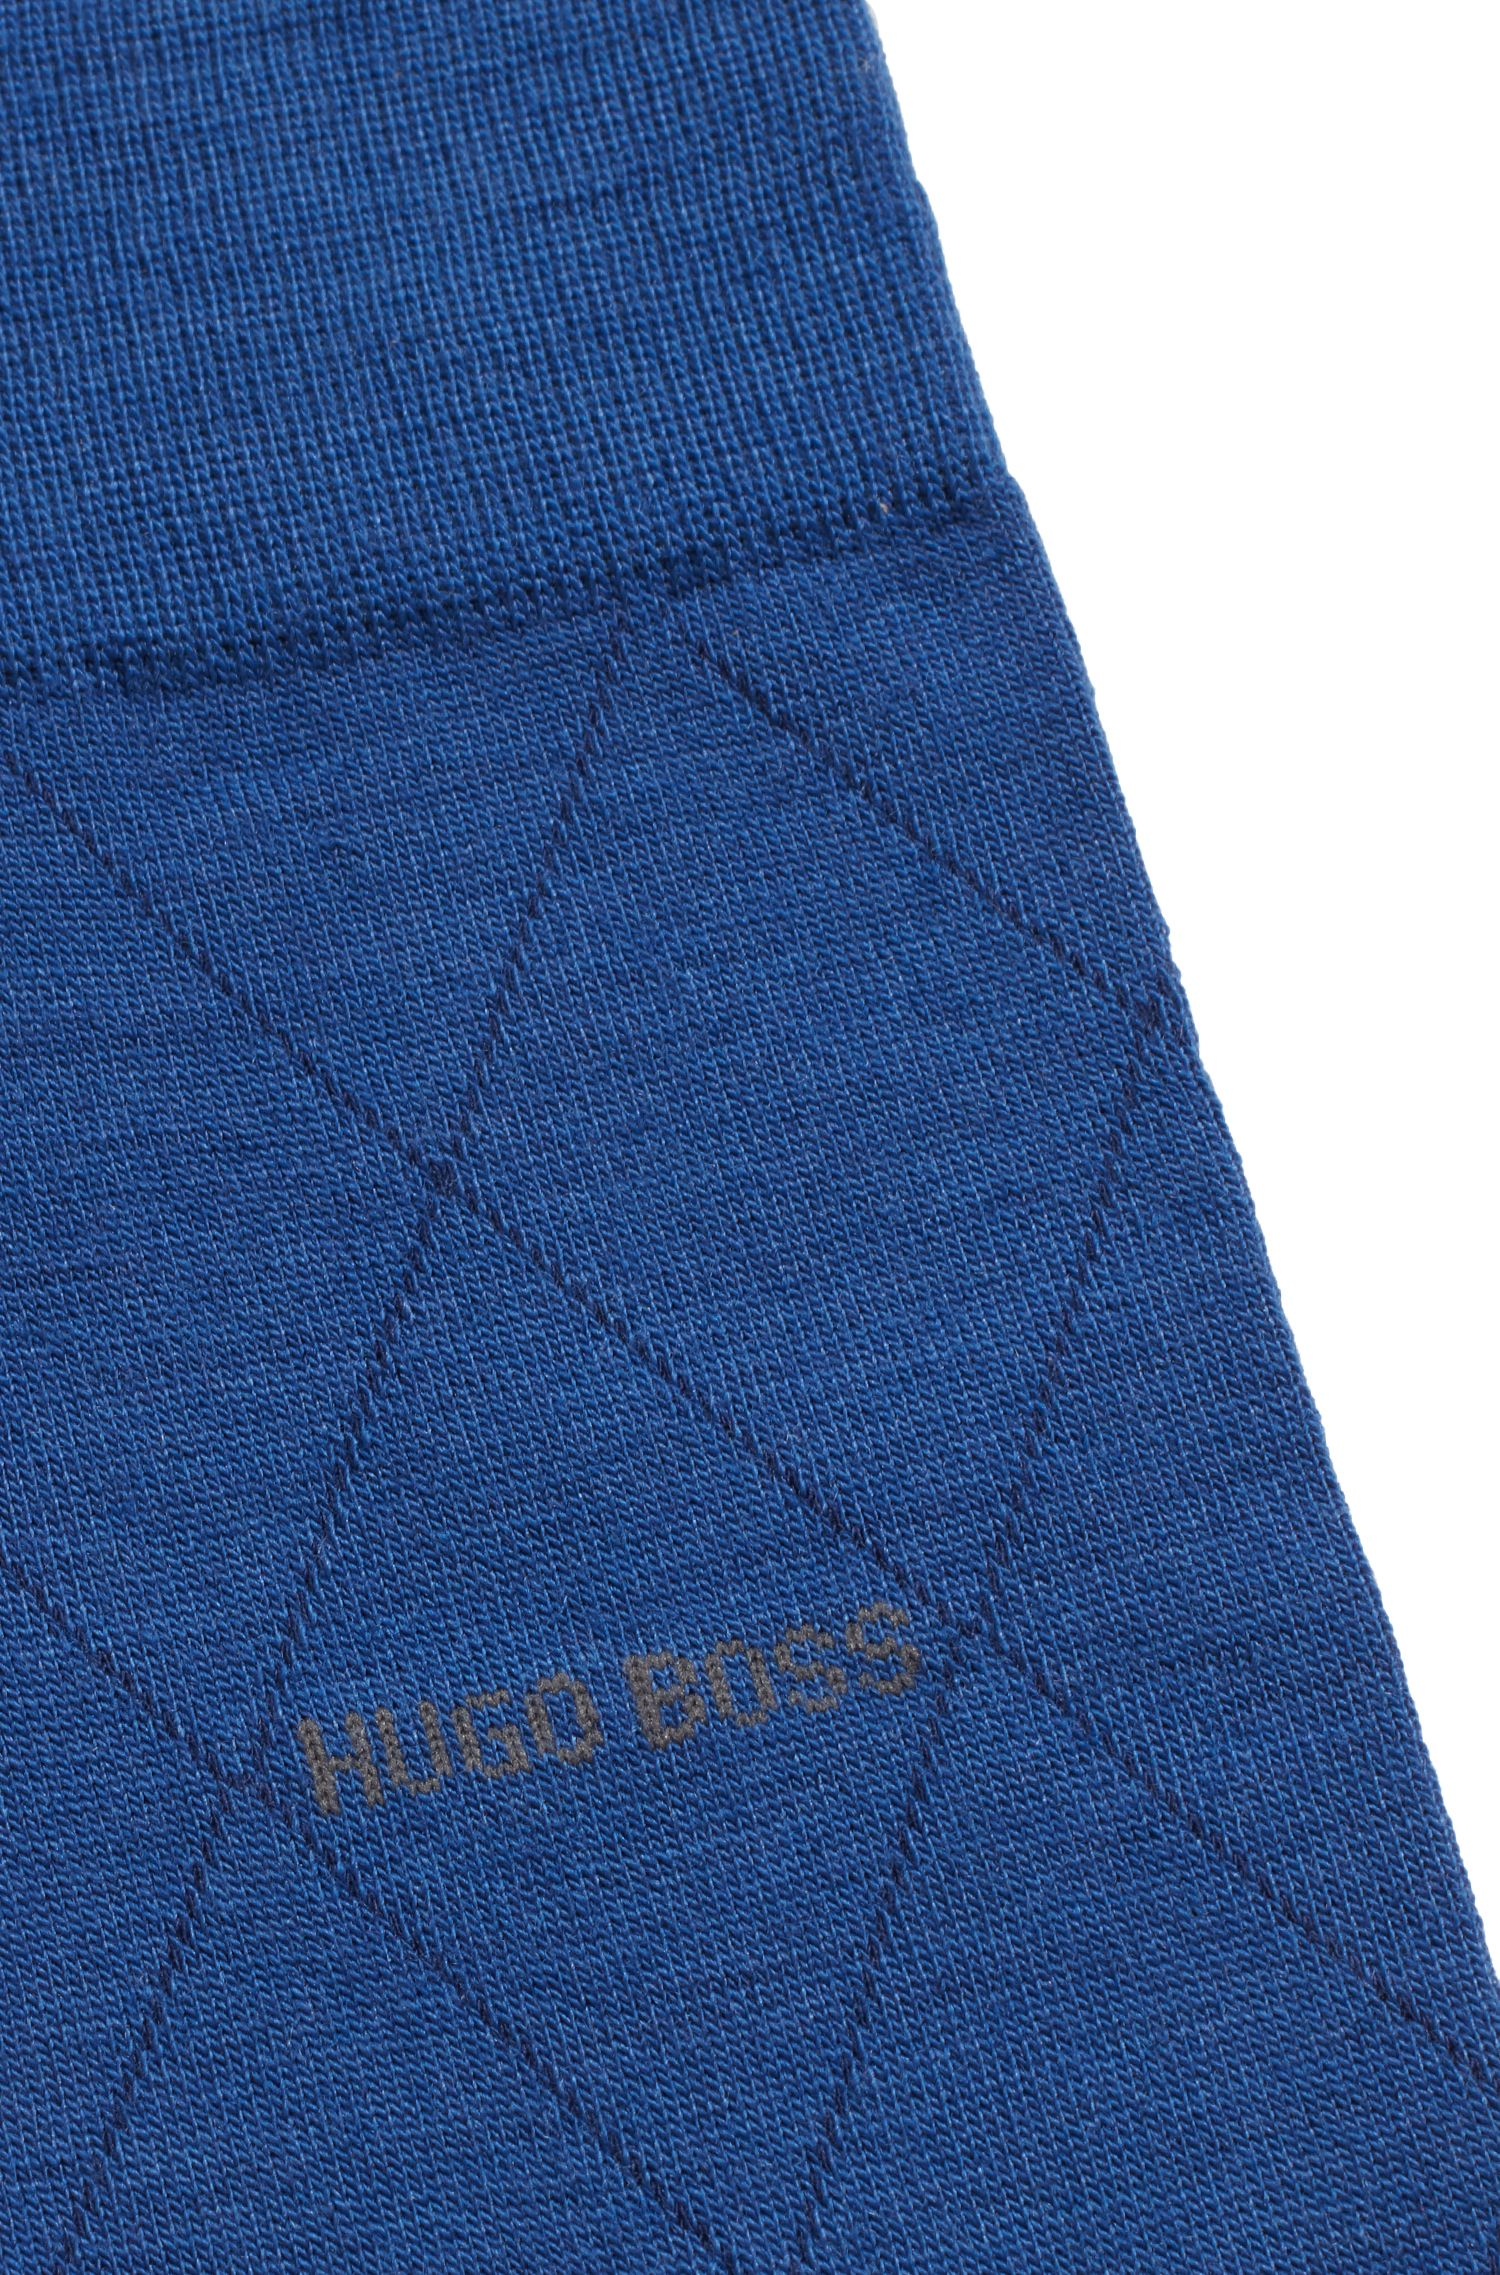 Mittelhohe Socken aus Woll-Mix mit kontrastfarbenem Logo, Blau